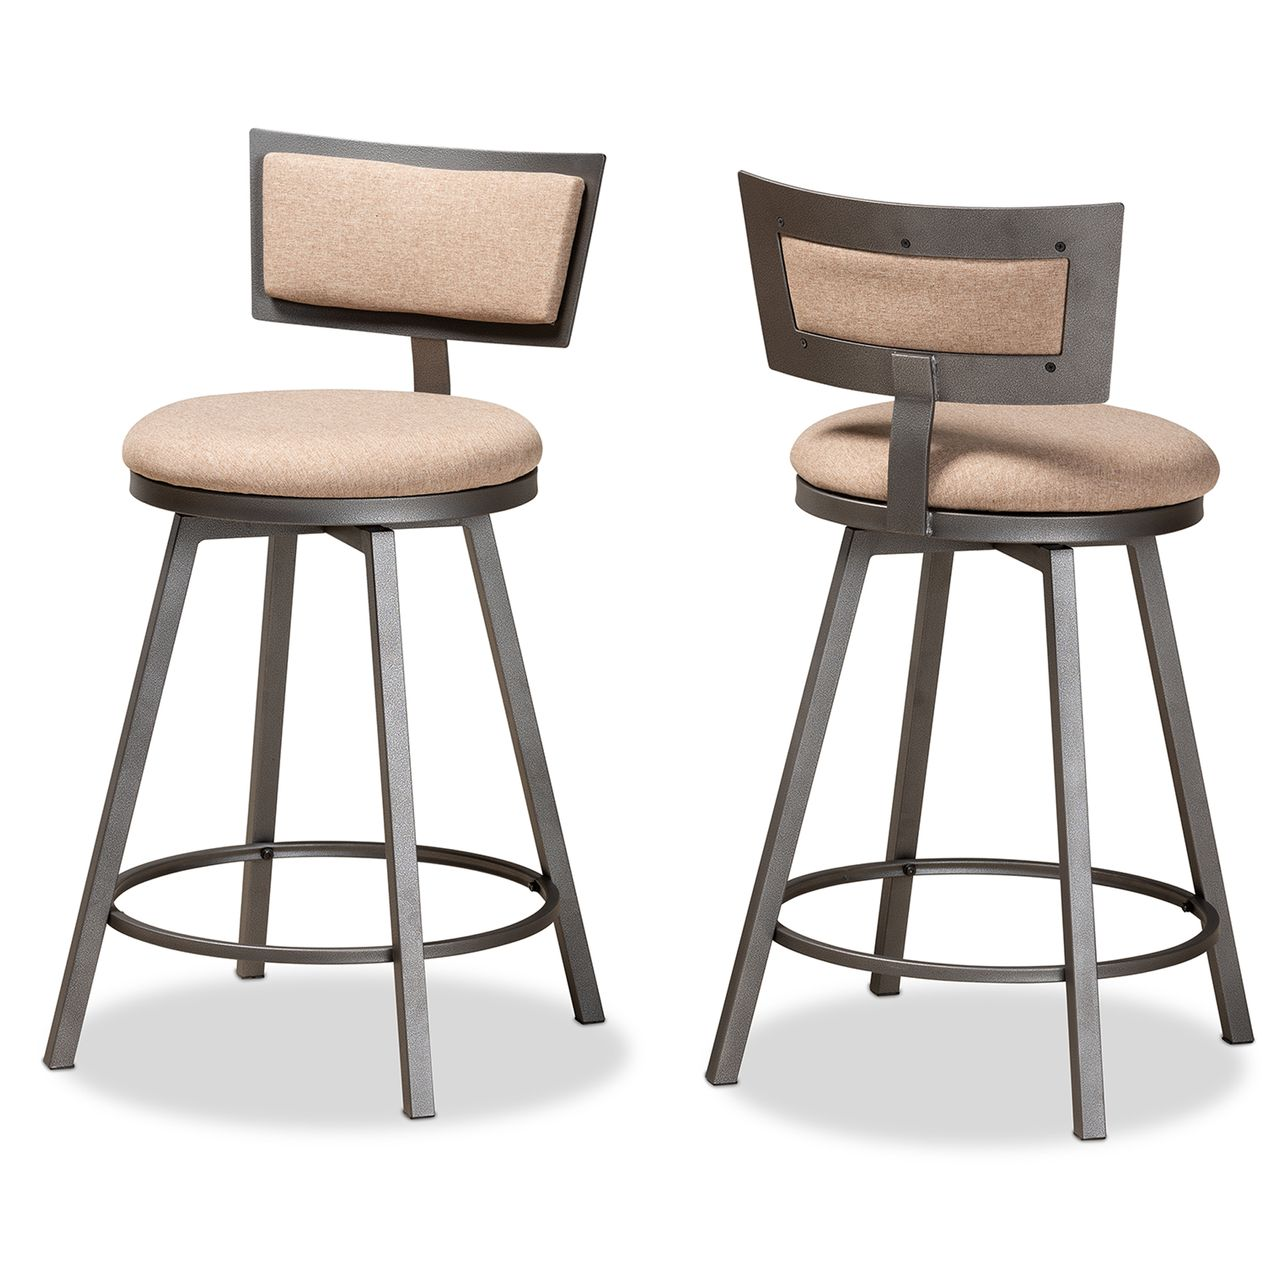 Baxton Studio Danson Light Brown and Grey 2-Piece Swivel Pub Chair Set